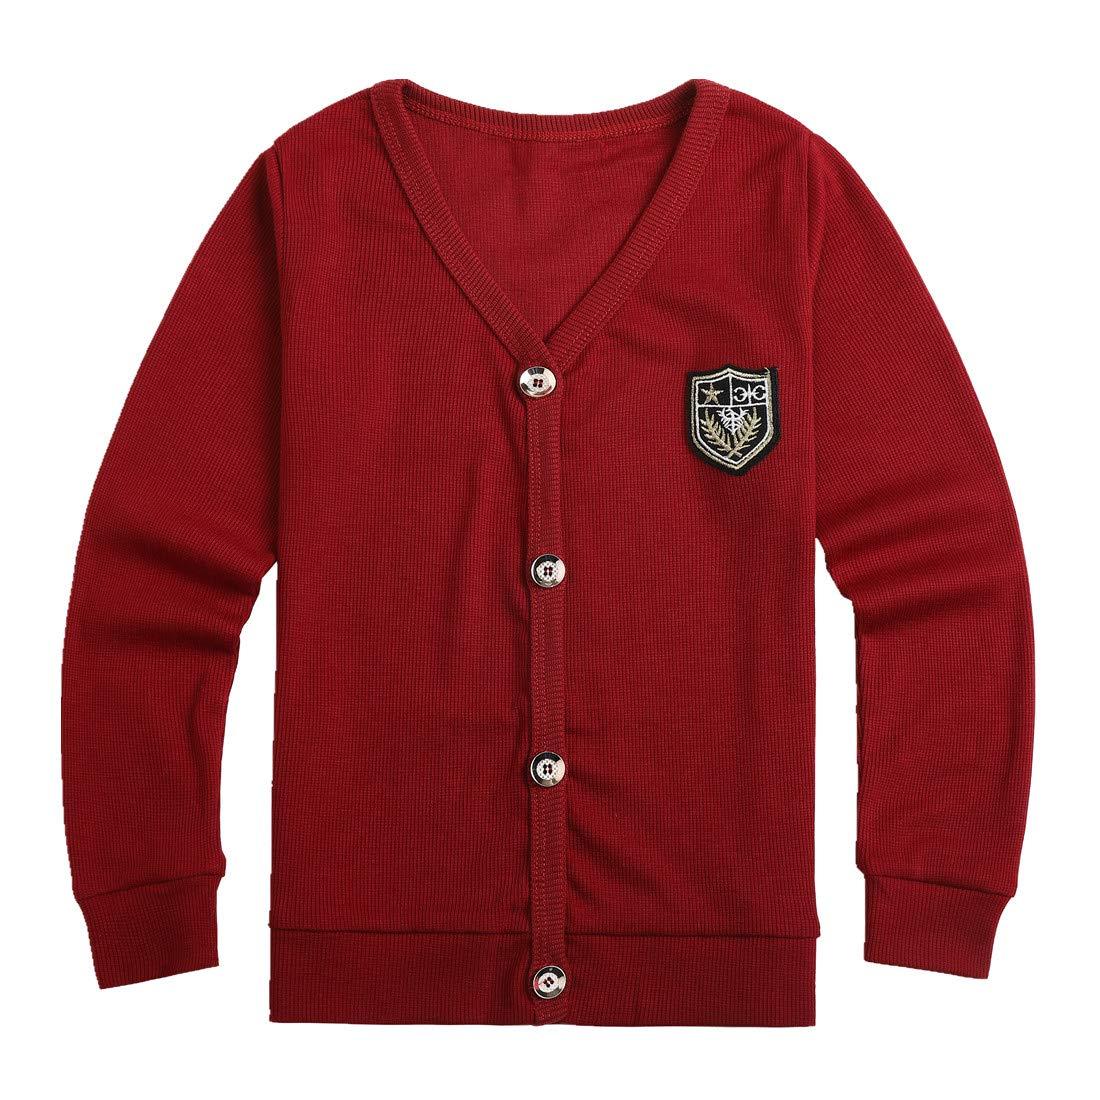 Sooxiwood Little Boys Cardigan Coat V-Neck Buttons Down